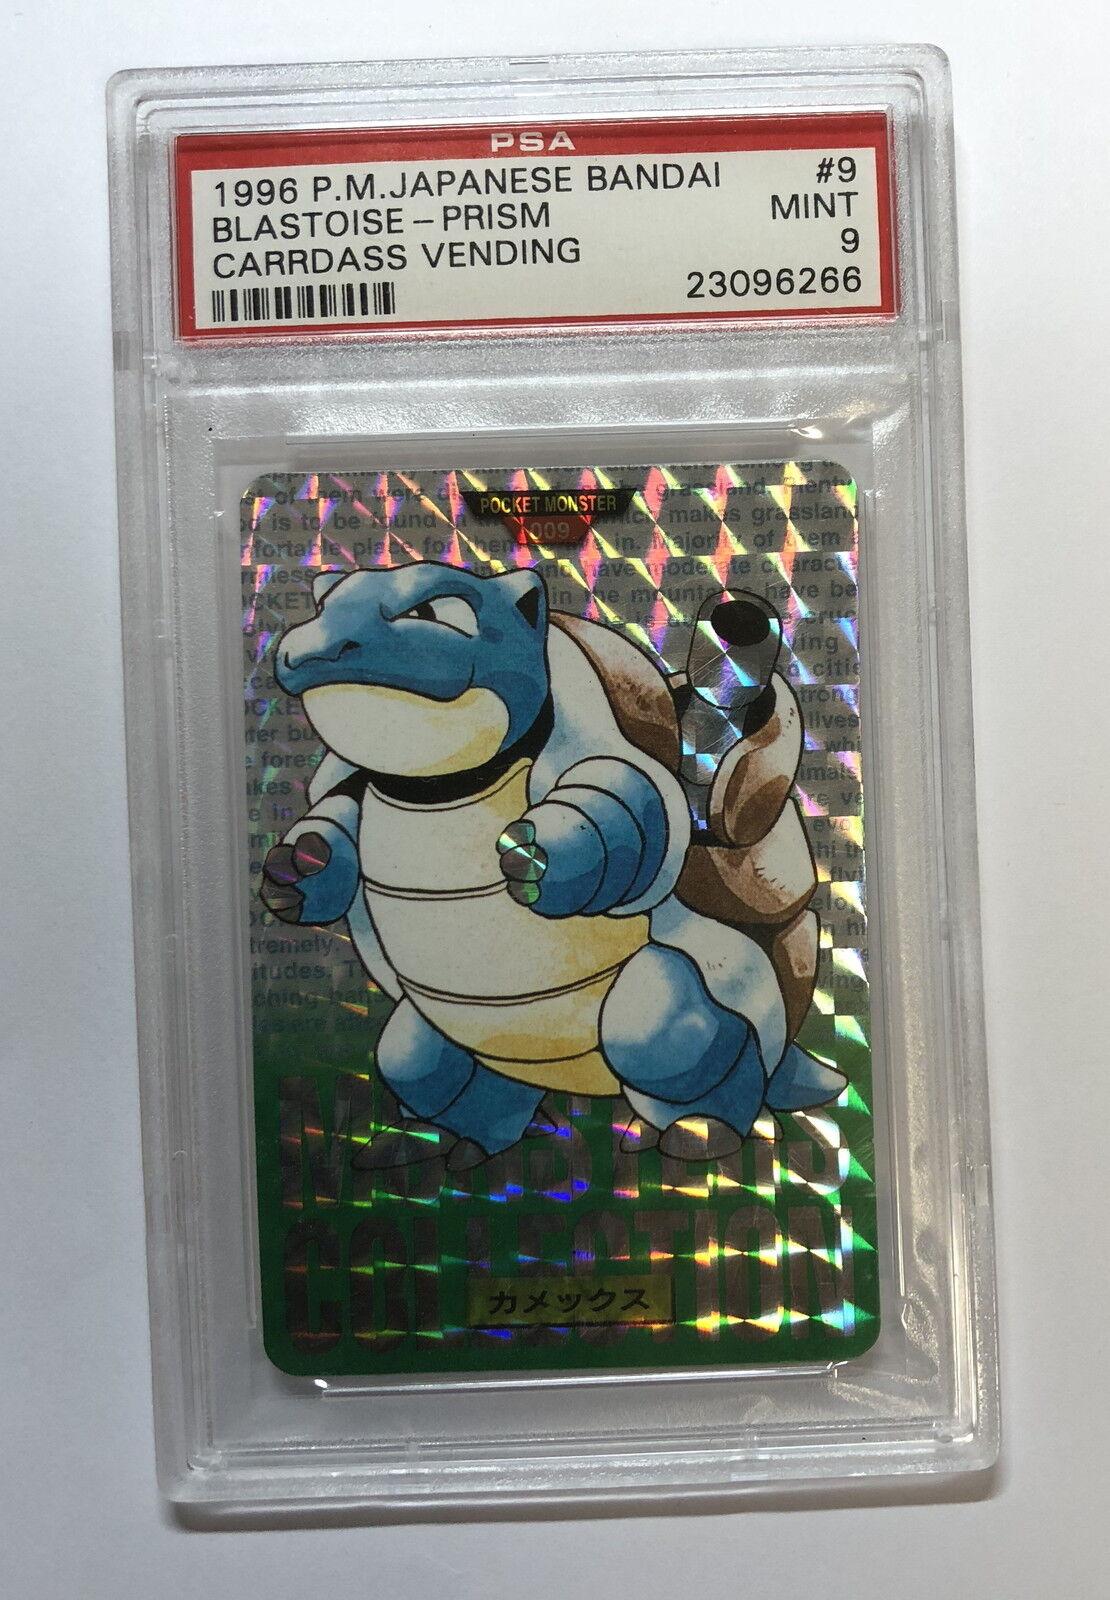 Pokemon PSA 9 MINT 1996 BLASTOISE Bandai Carddass Prism Holofoil GREEN VERSION